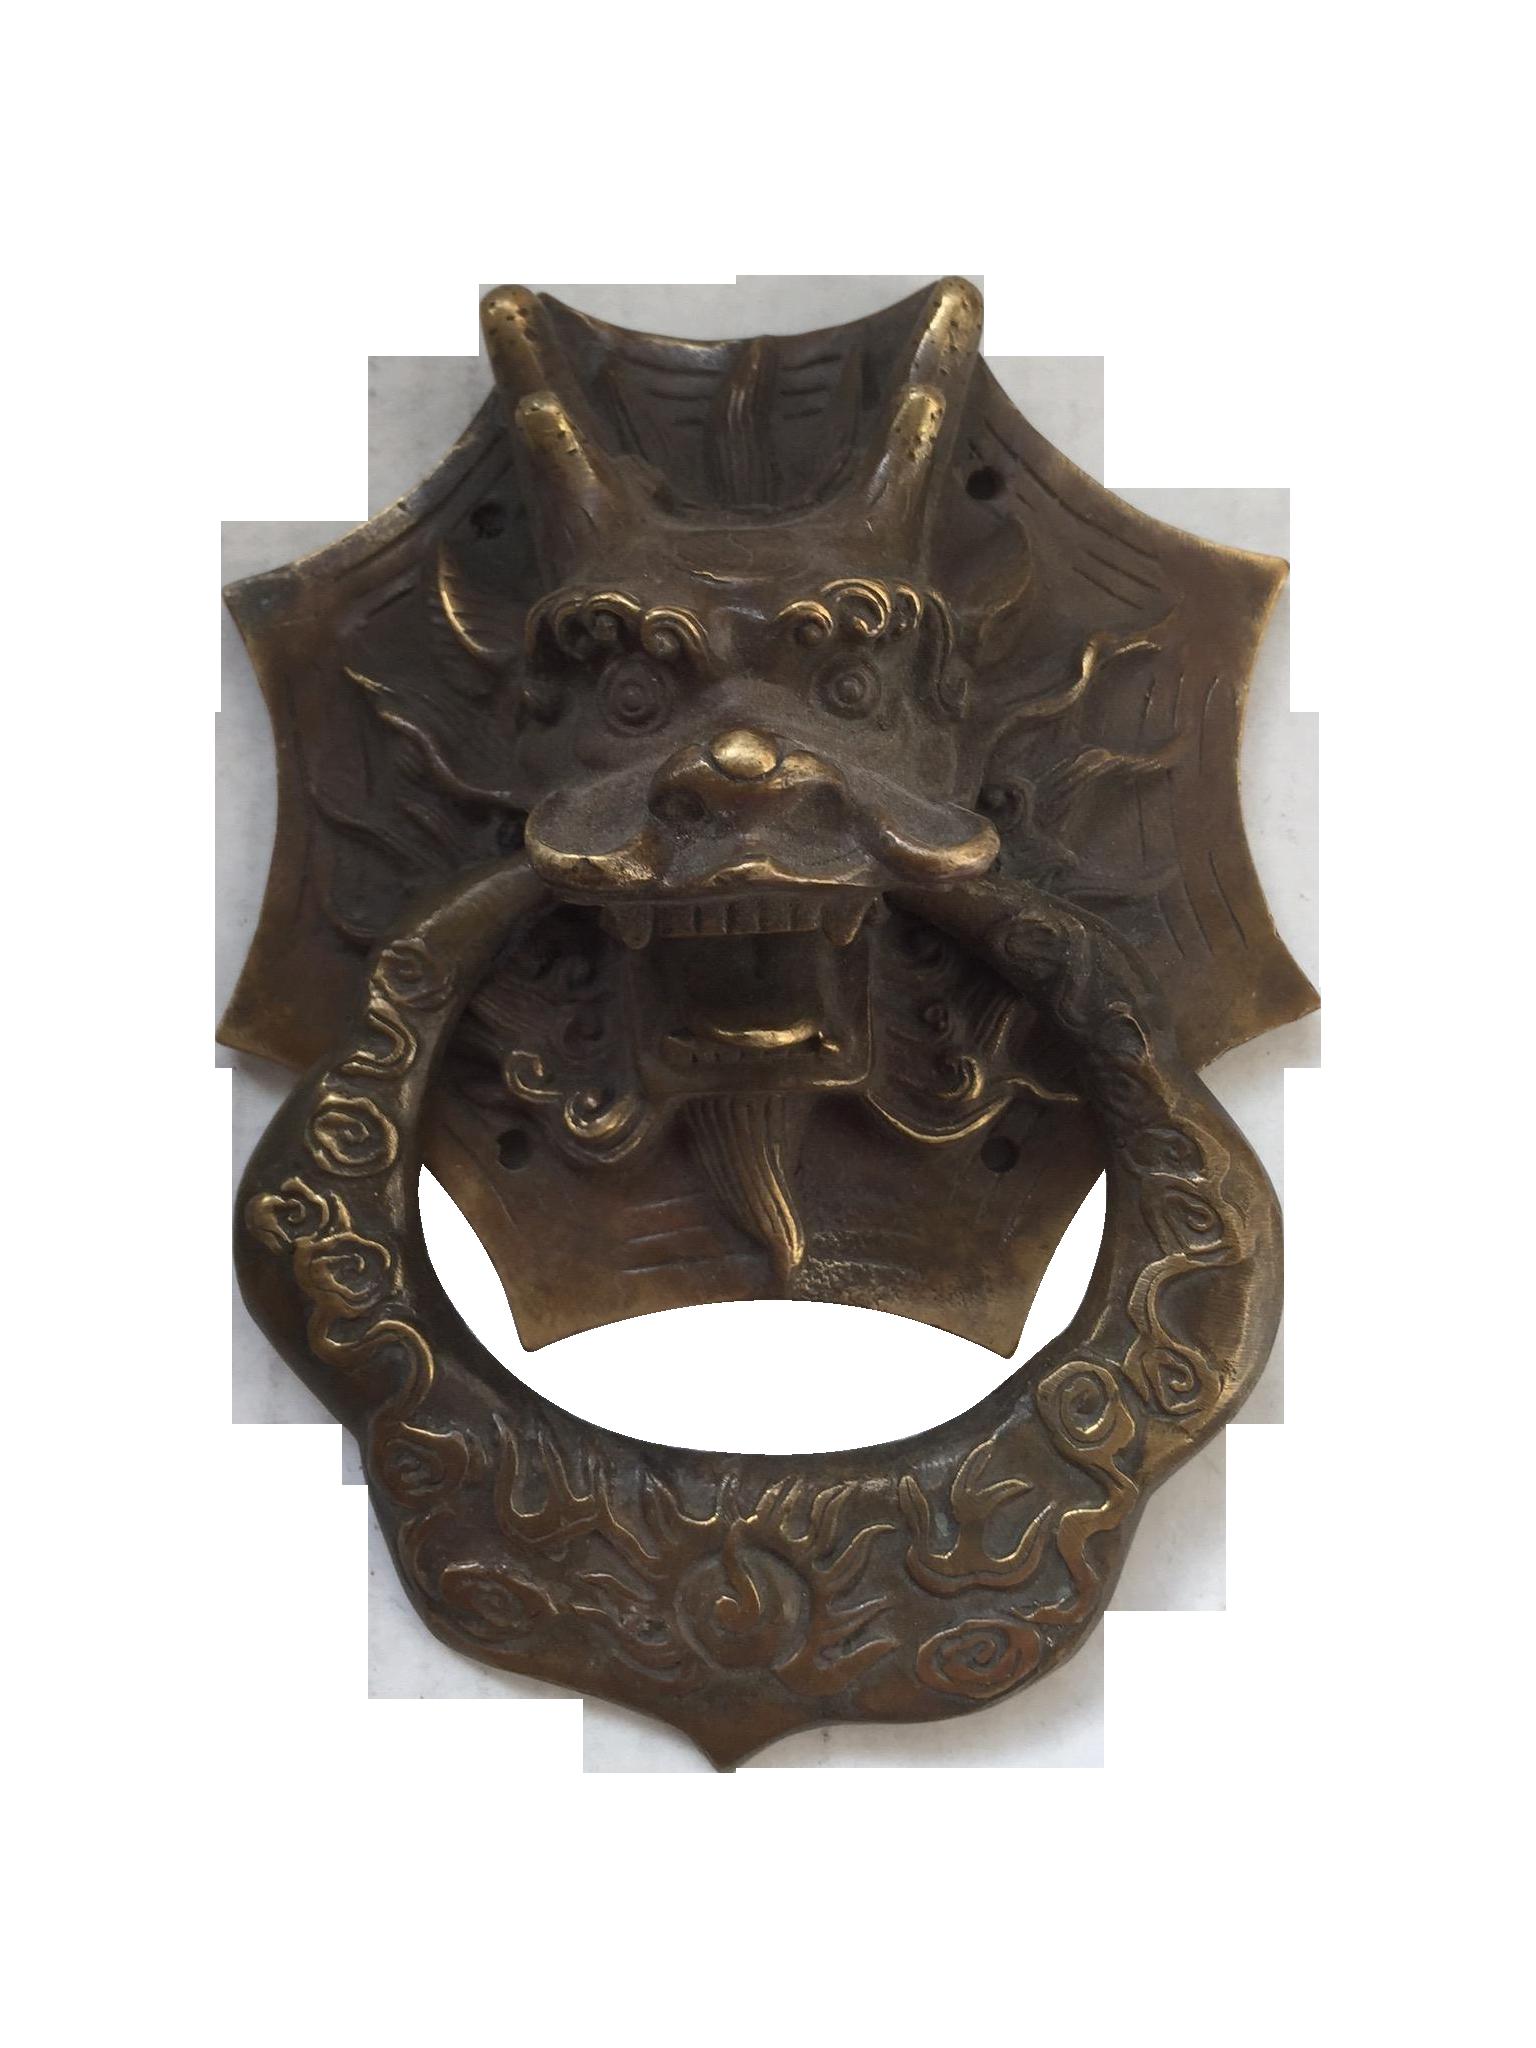 Asian Dragon Brass Door Knocker on Chairish.com